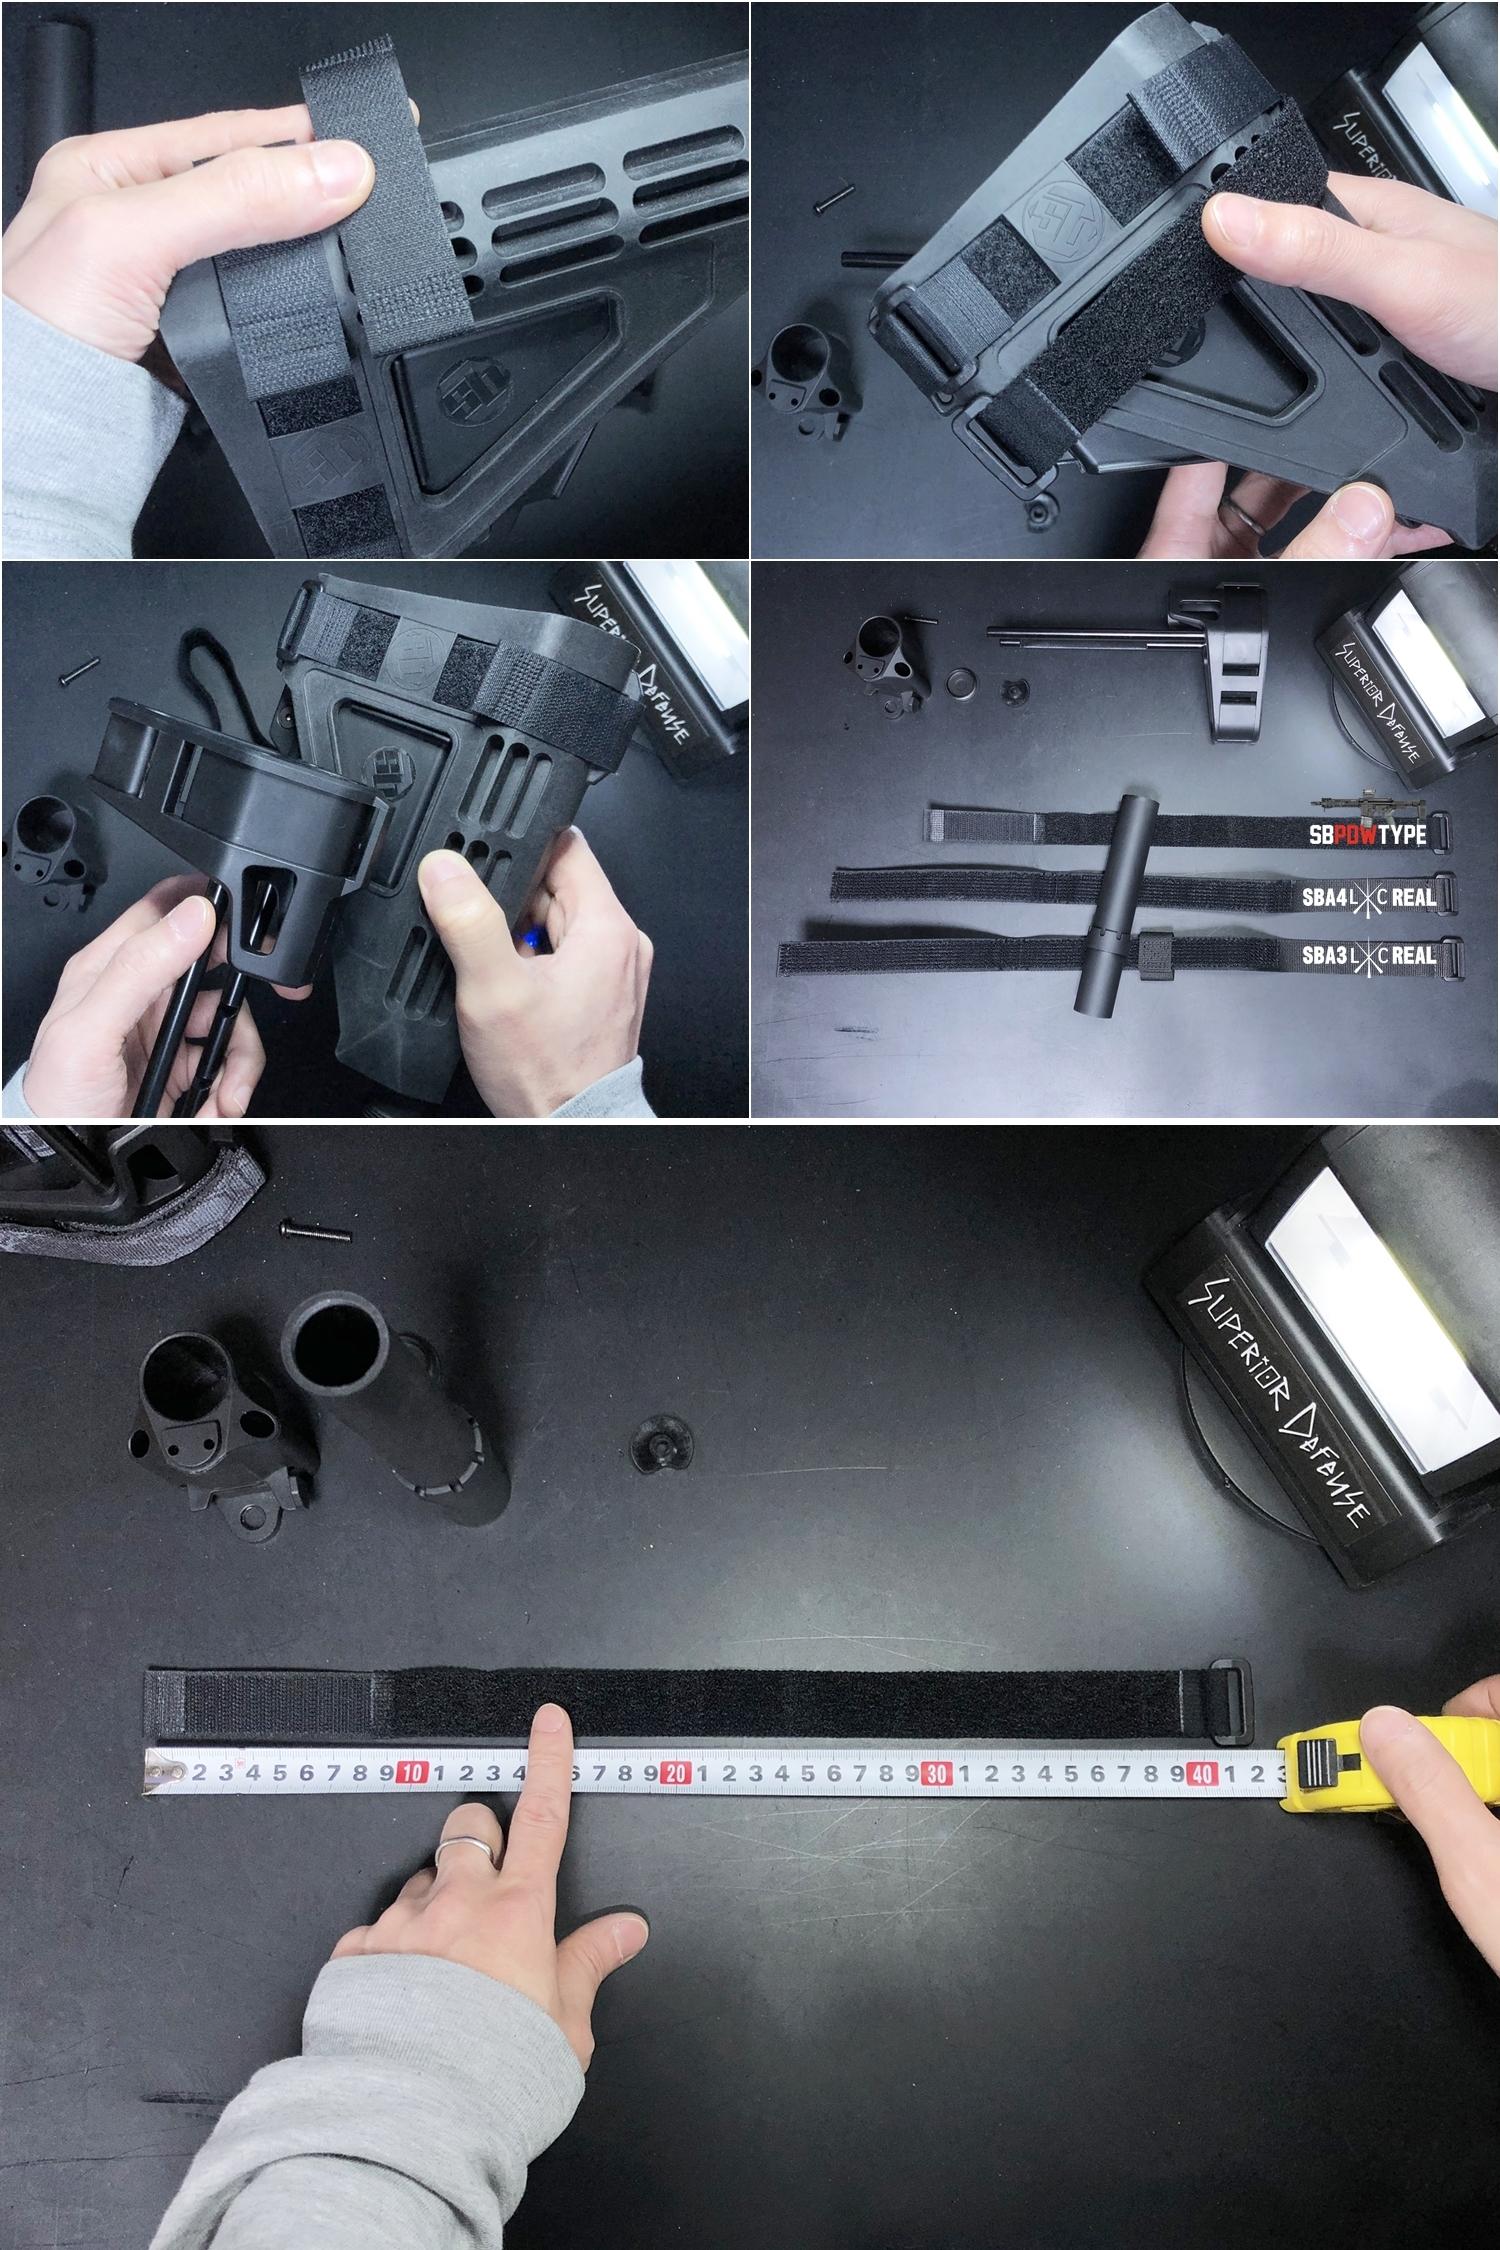 9 SB TACTICAL SB-PDW TYPE!! ちょっと気になって 購入~検証~DIY してみた!! STD電動ガン専用 M4 AR-15 スタビブレース バットストック & NOVESKE GEN3 MB専用 ポン付け ストック スリング プレート作製!!